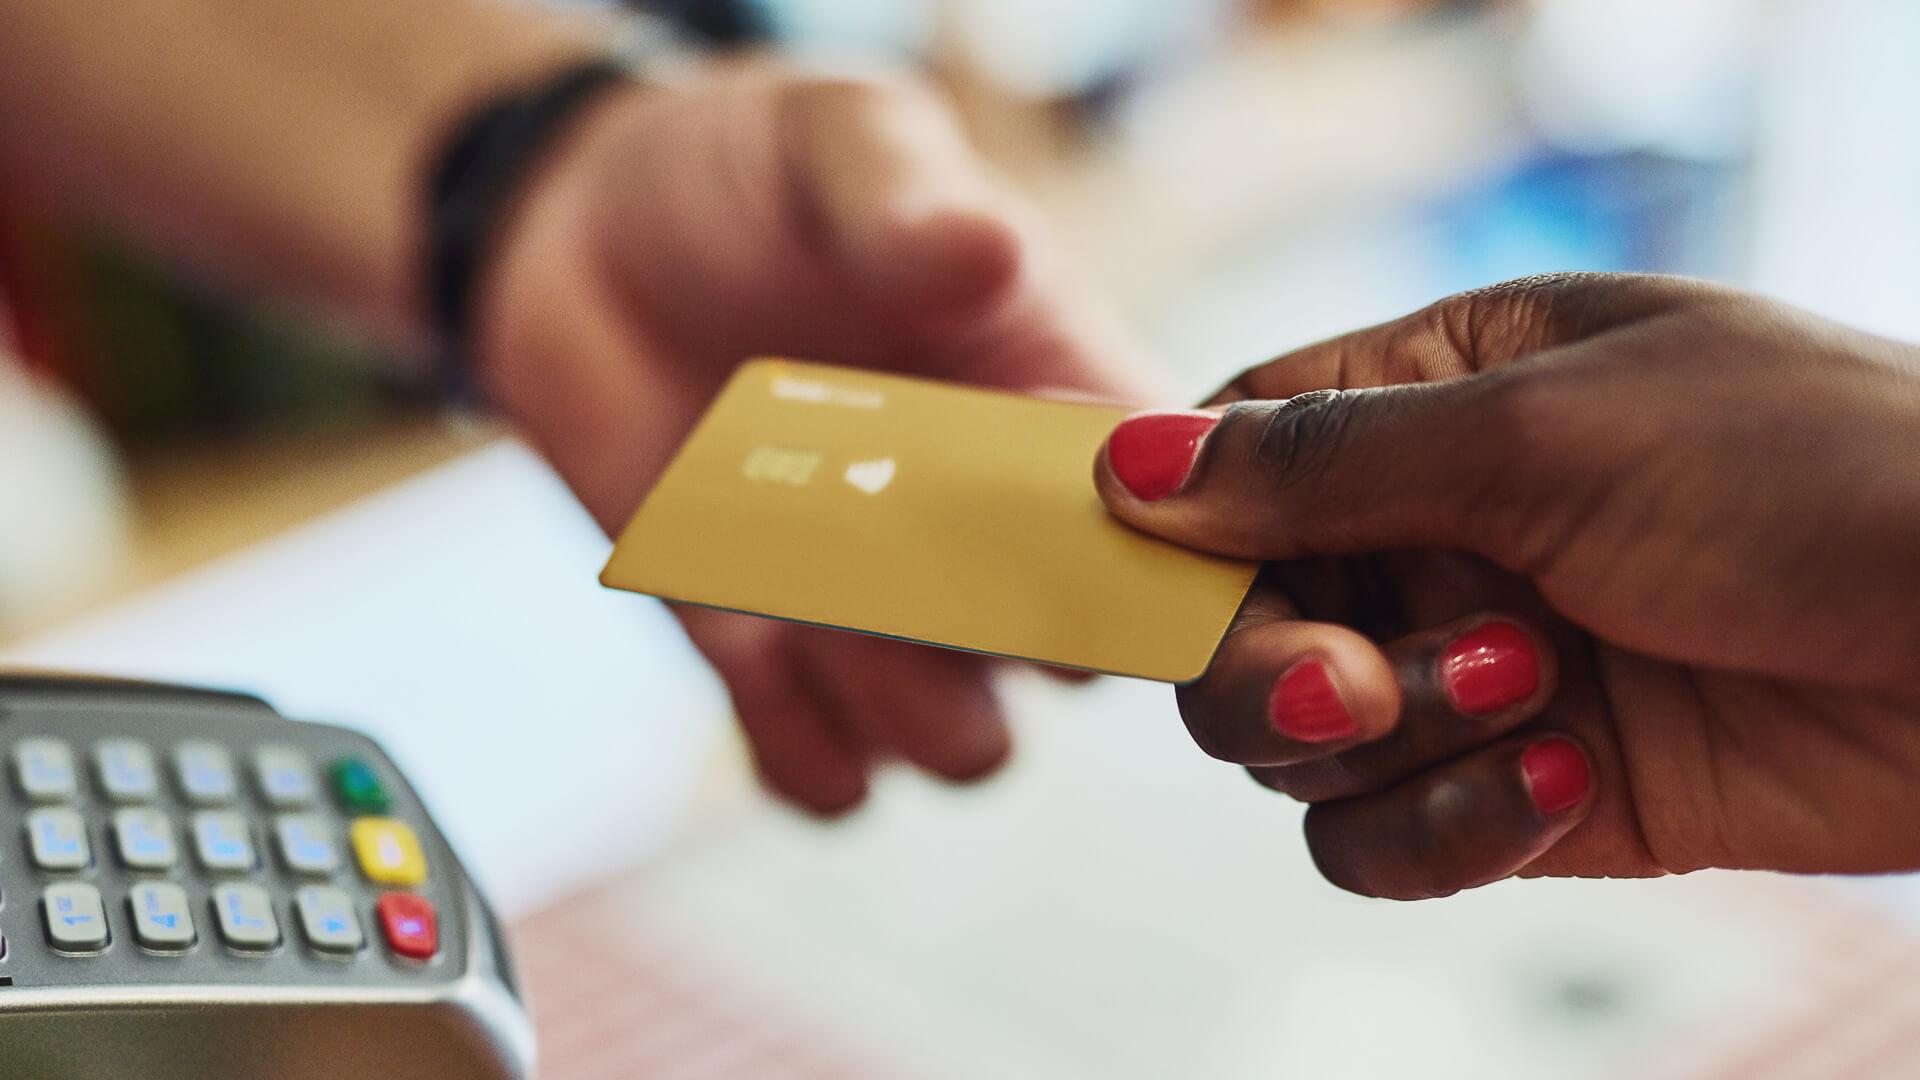 10 Best Credit Cards For Bad